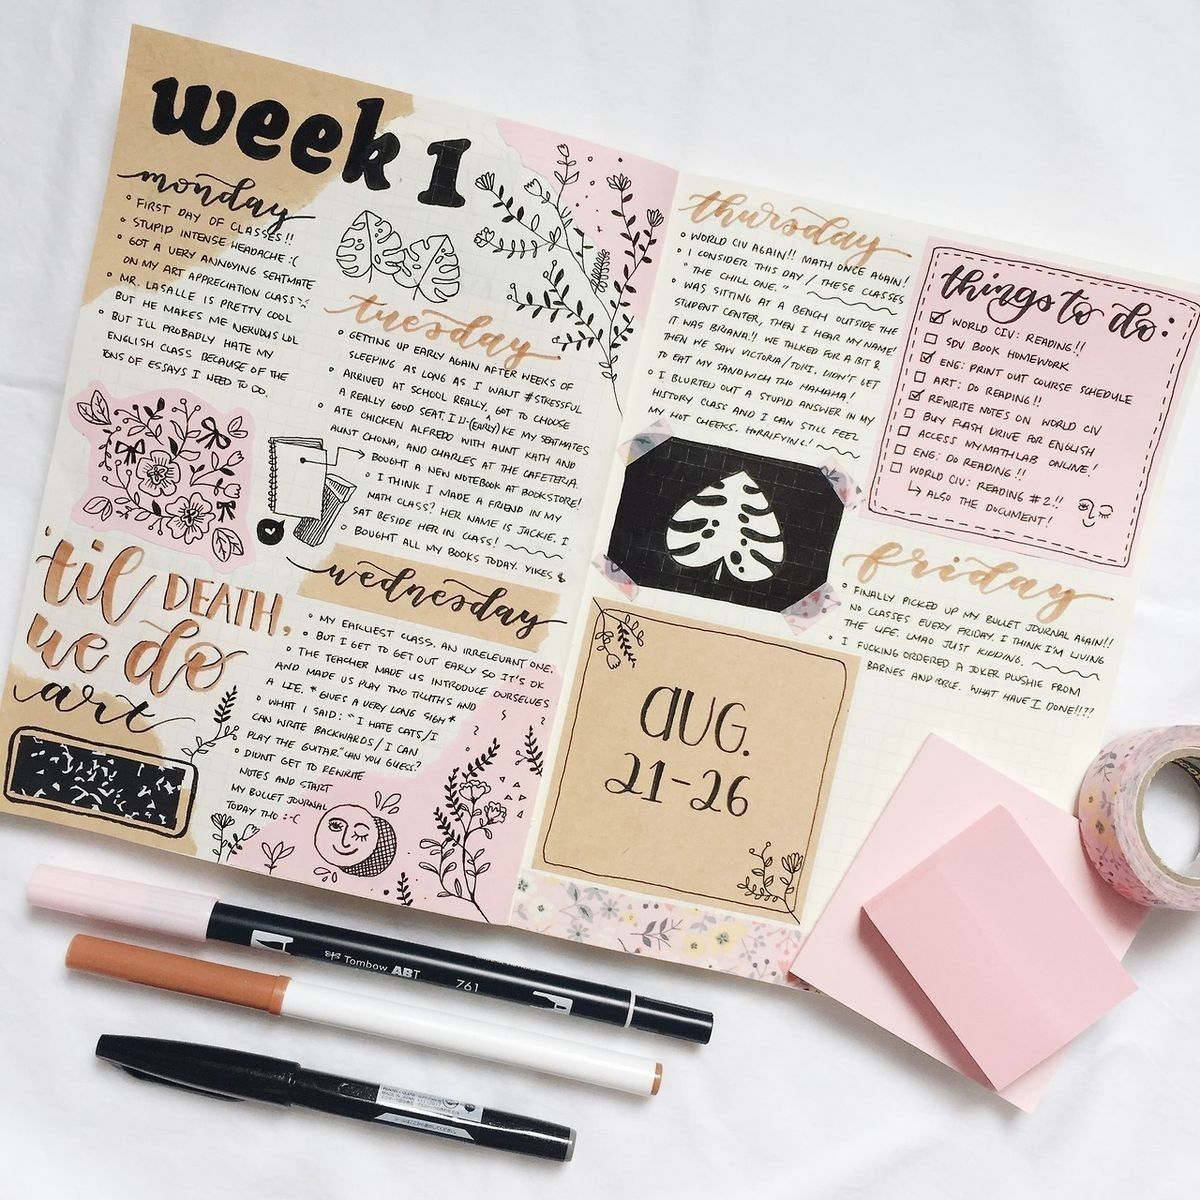 900+ Bullet Journal ideas | bullet journal, journal, bullet journal  inspiration